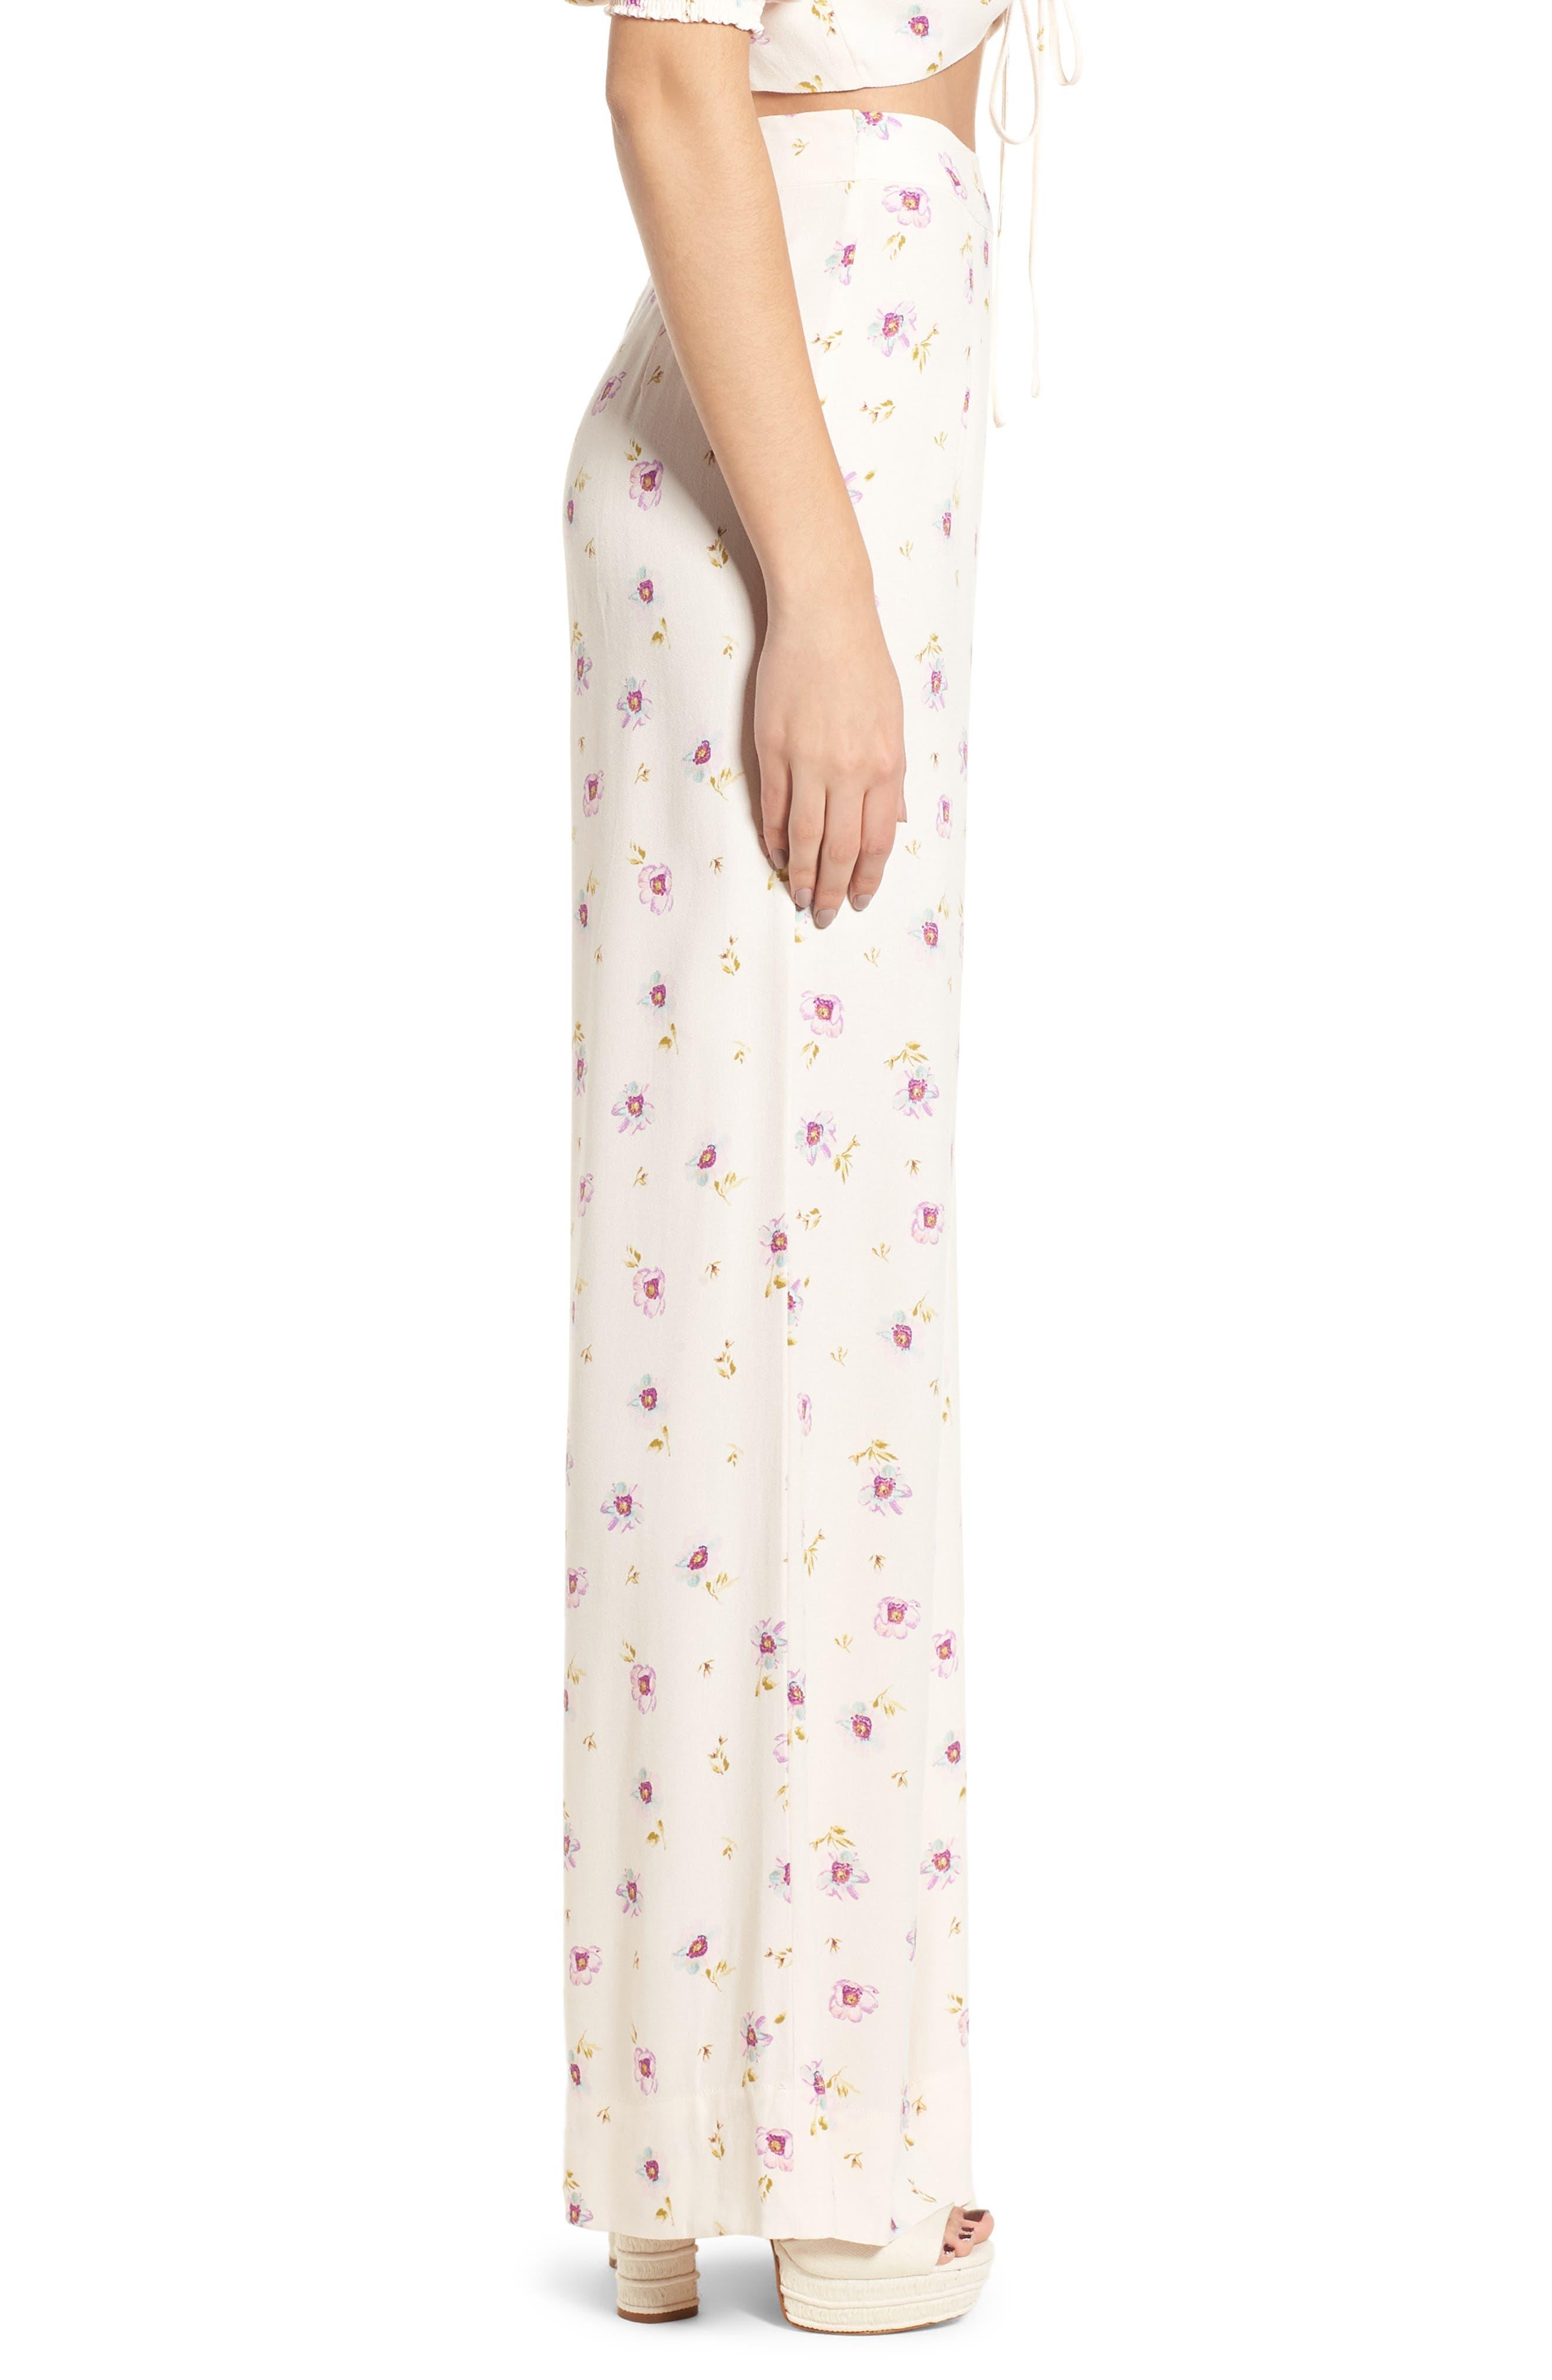 Carter High Waist Wide Leg Pants,                             Alternate thumbnail 4, color,                             Lilac Floral